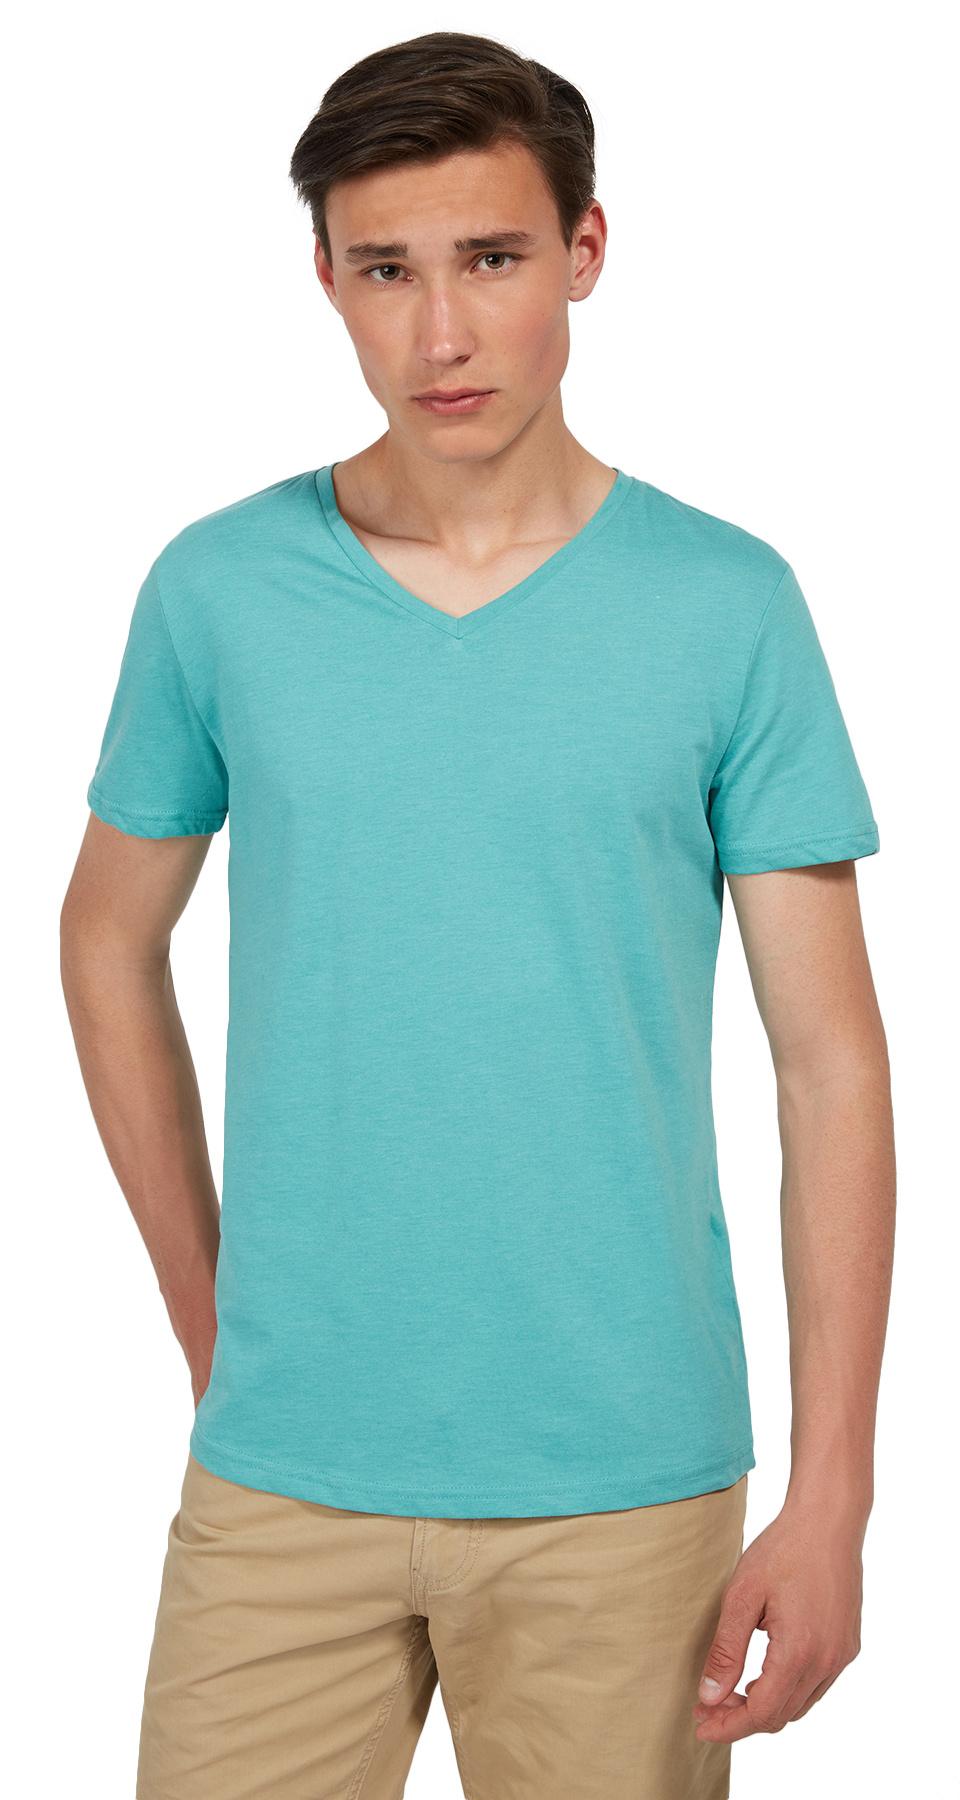 Tom Tailor Denim pánské triko 10381010012/7515 Zelená XL